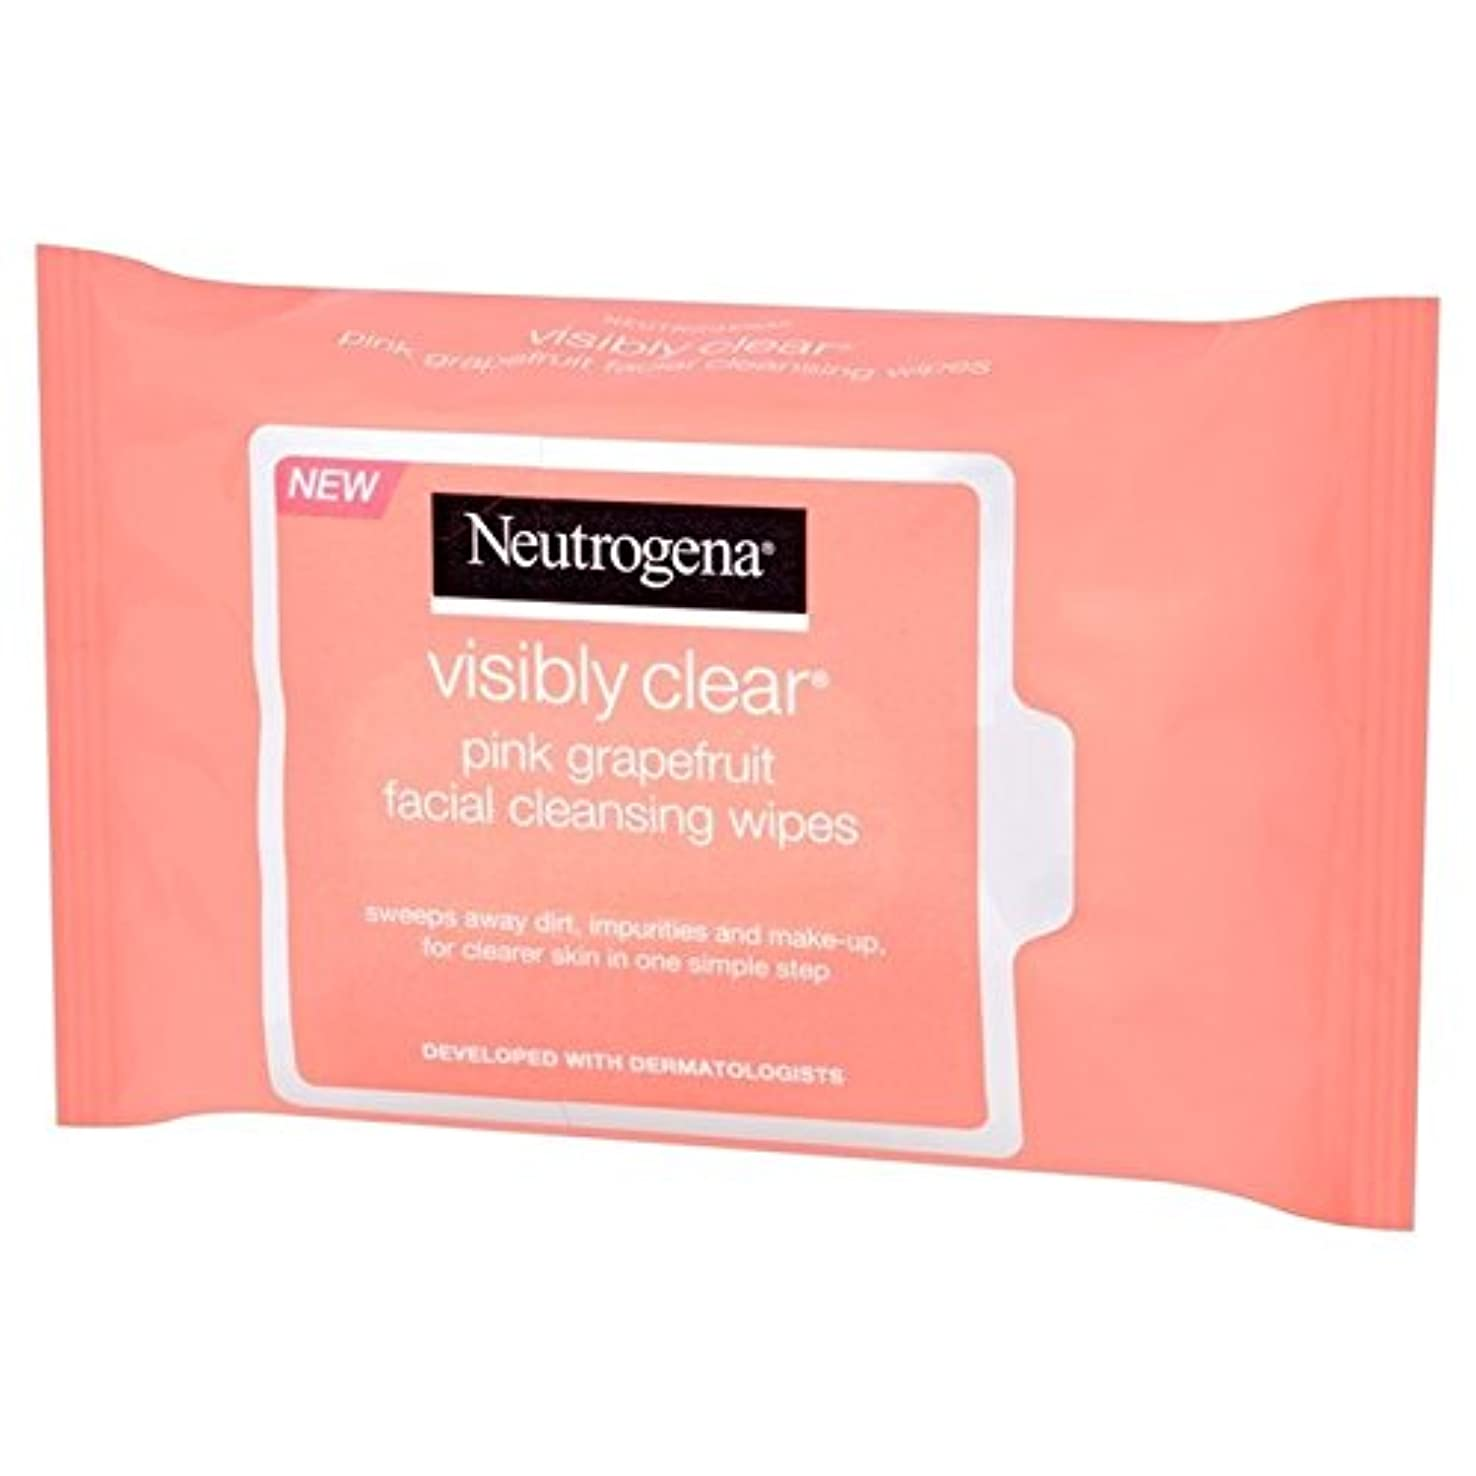 Neutrogena Visibly Clear Pink Grapefruit Wipes 25 per pack (Pack of 6) - ニュートロジーナ目に見えて明らかピンクグレープフルーツは、パックごとに25...